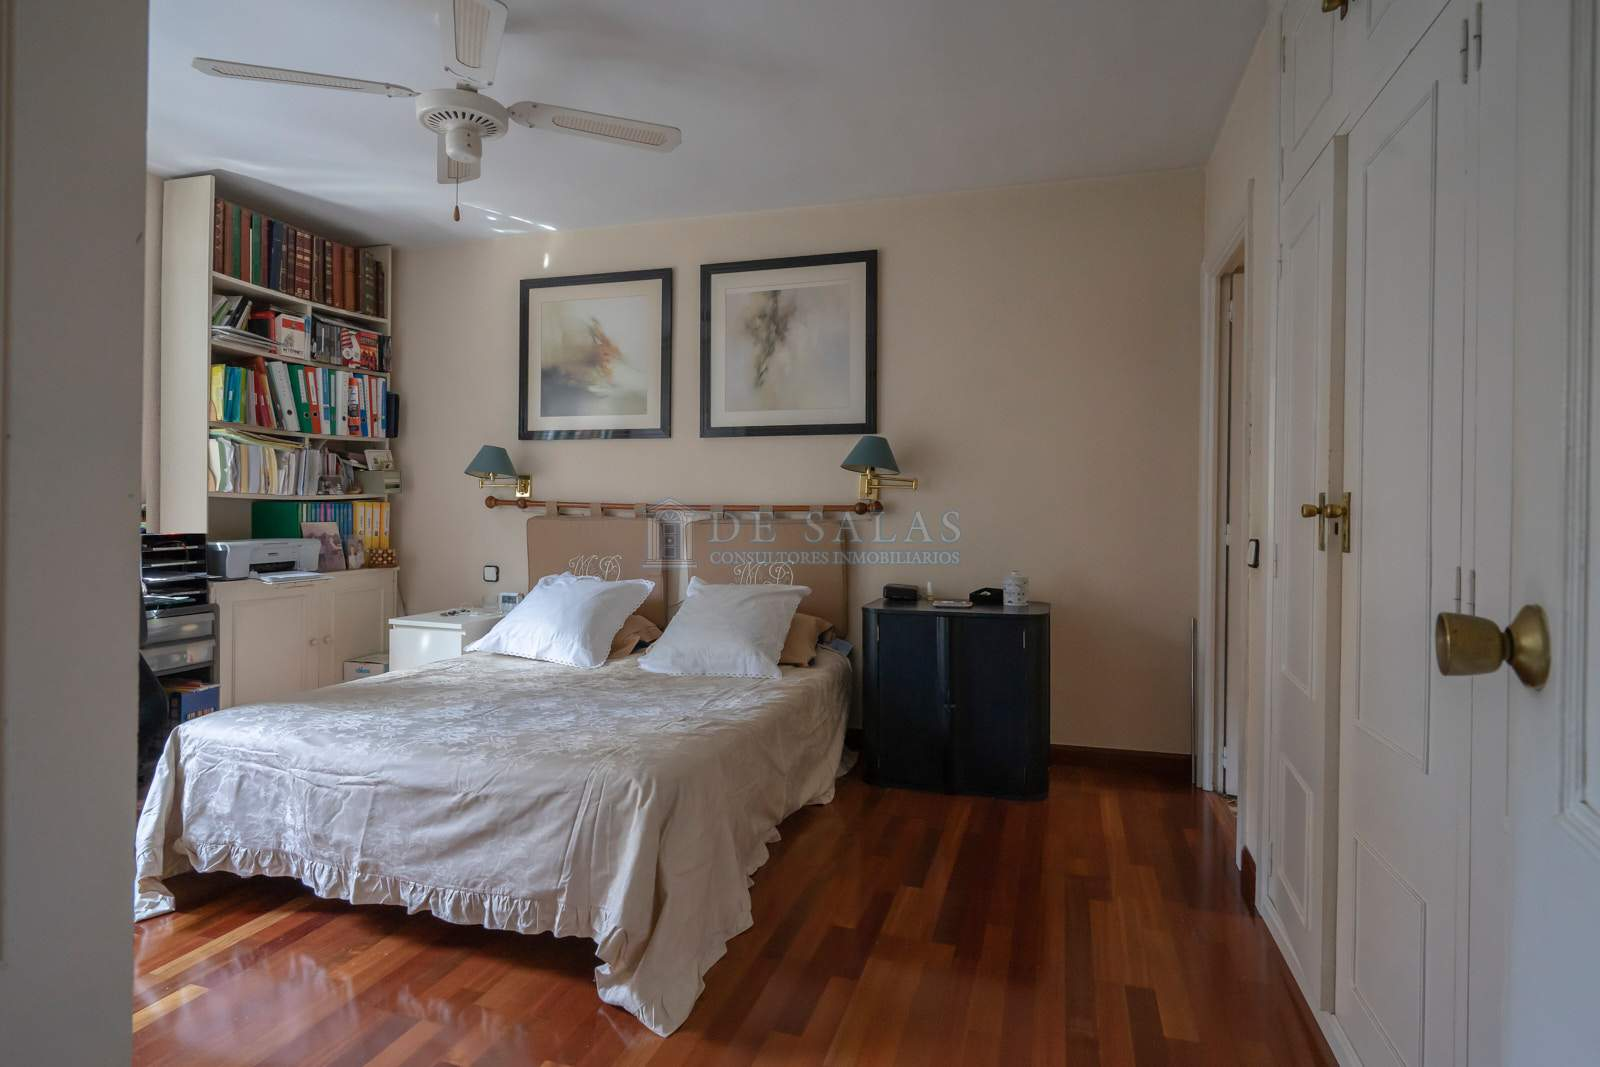 05-Dormitorio Piso Soto de la Moraleja